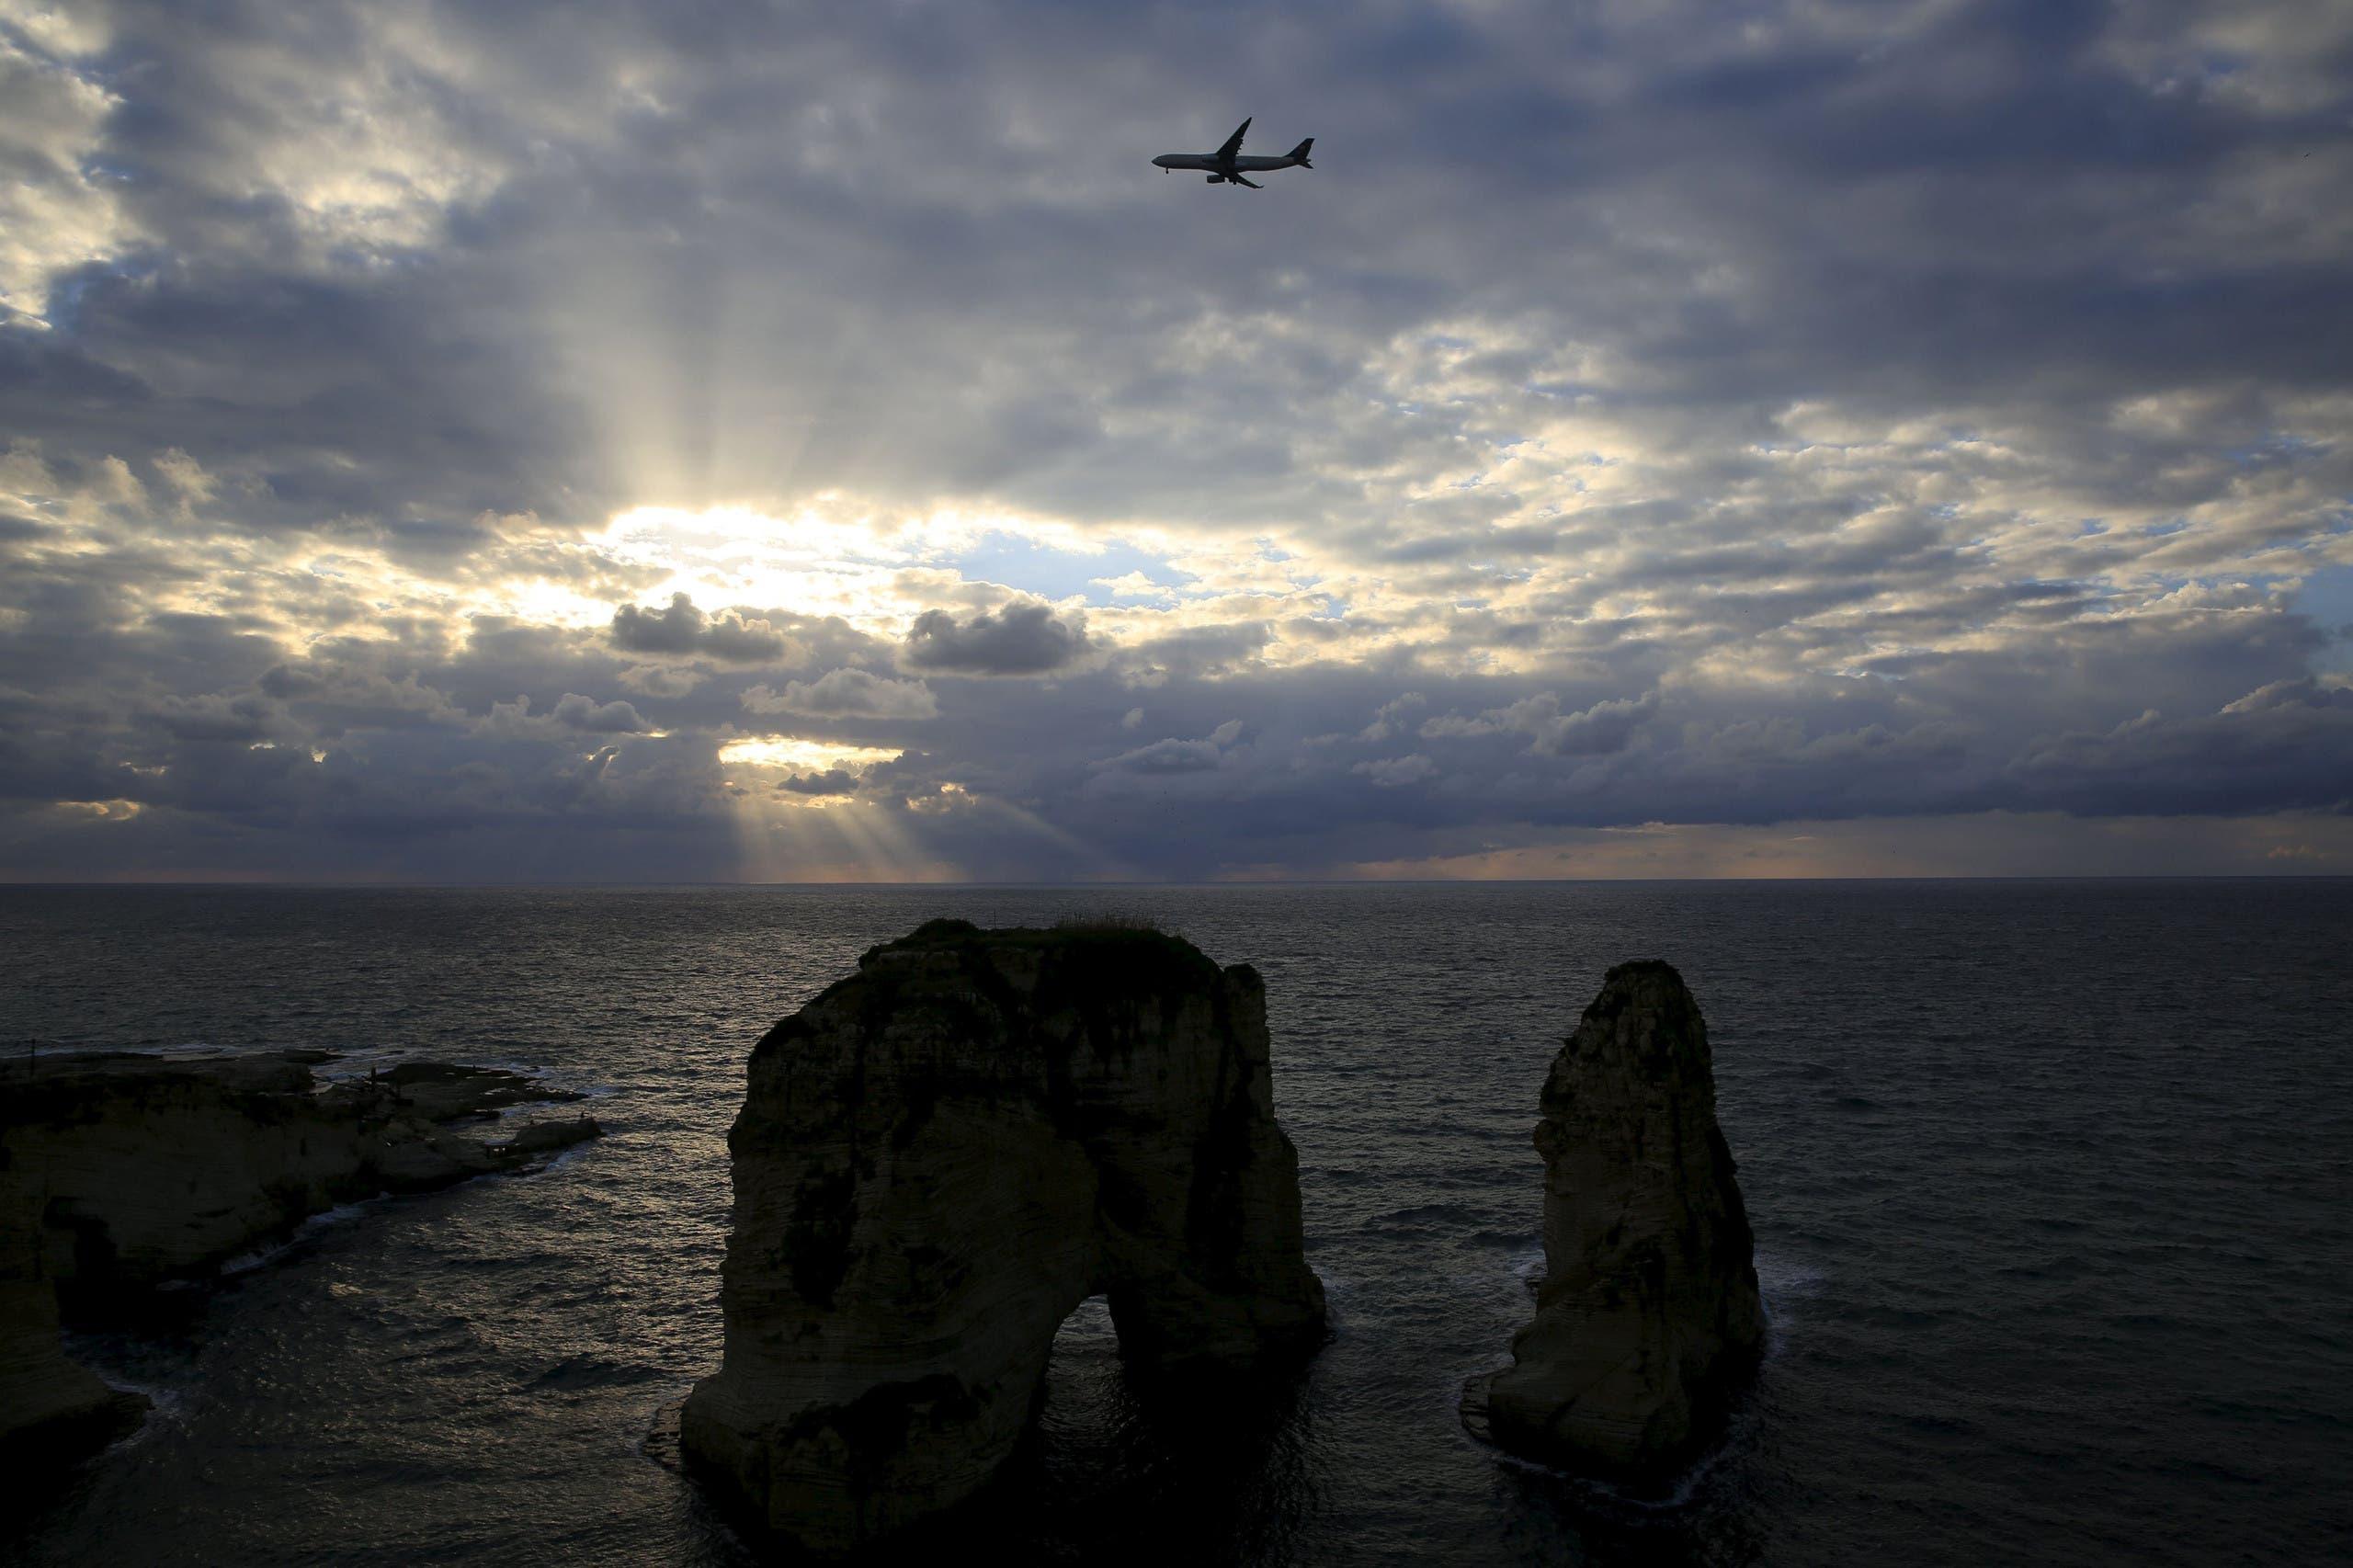 Sunsets around the Arab world